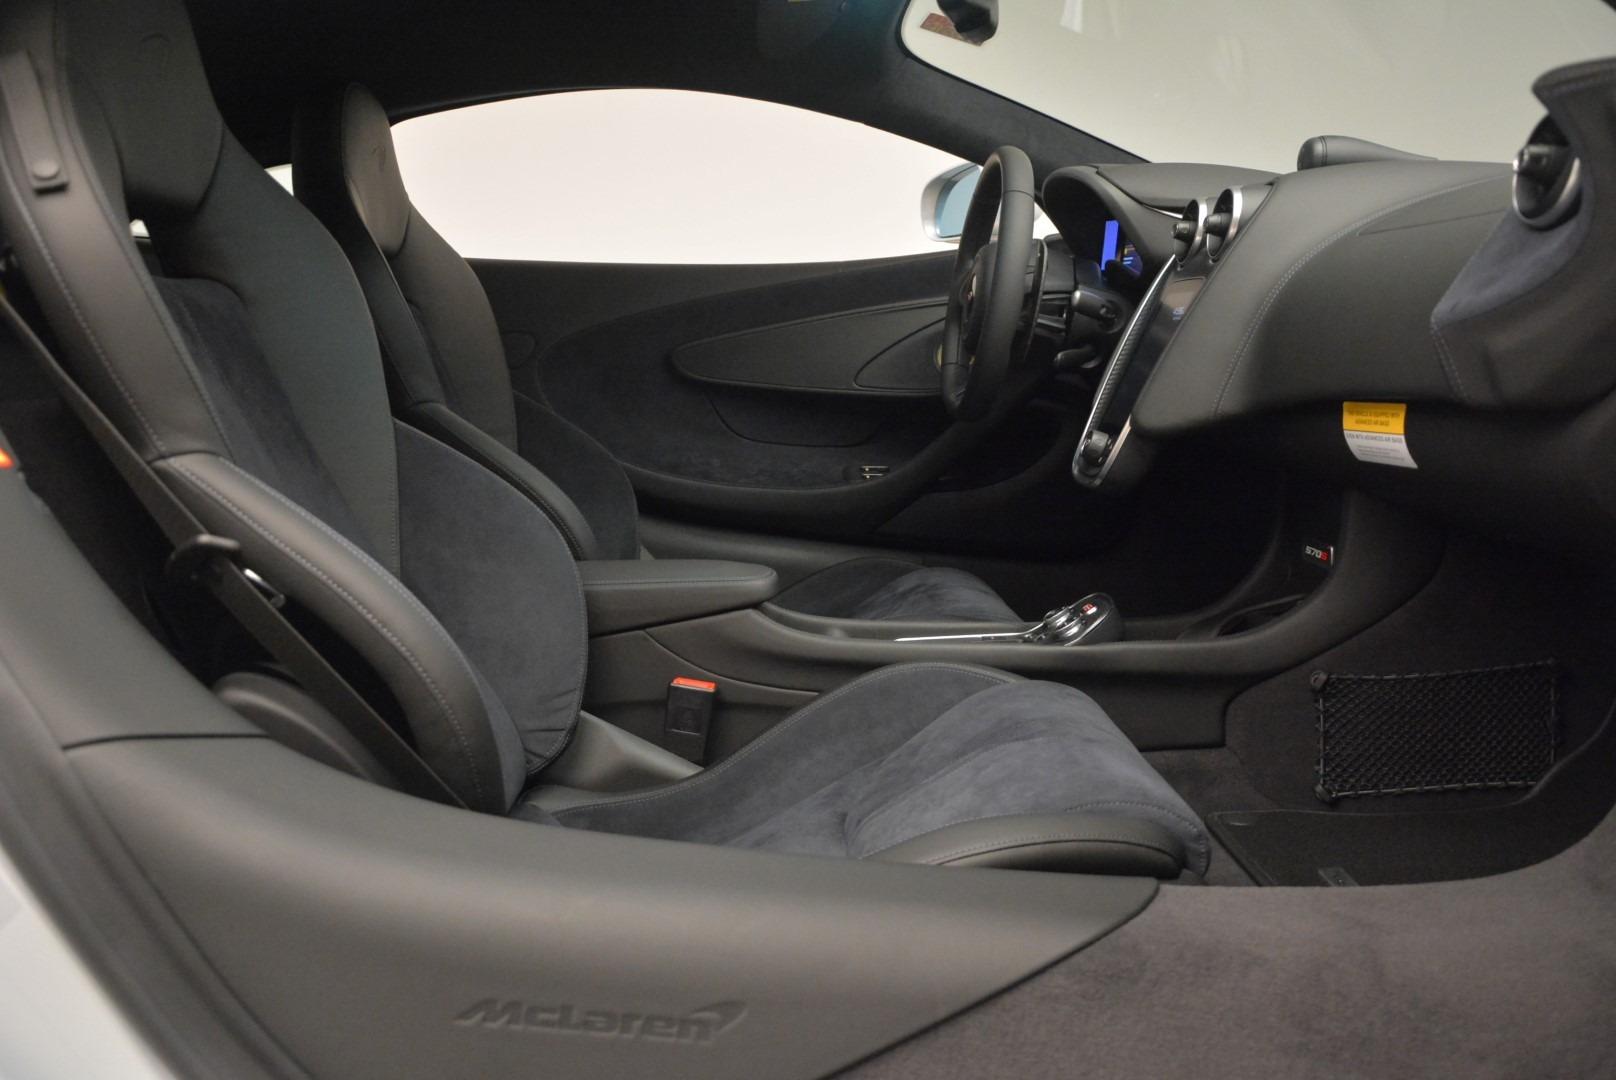 Used 2017 McLaren 570S Coupe For Sale In Westport, CT 2642_p19